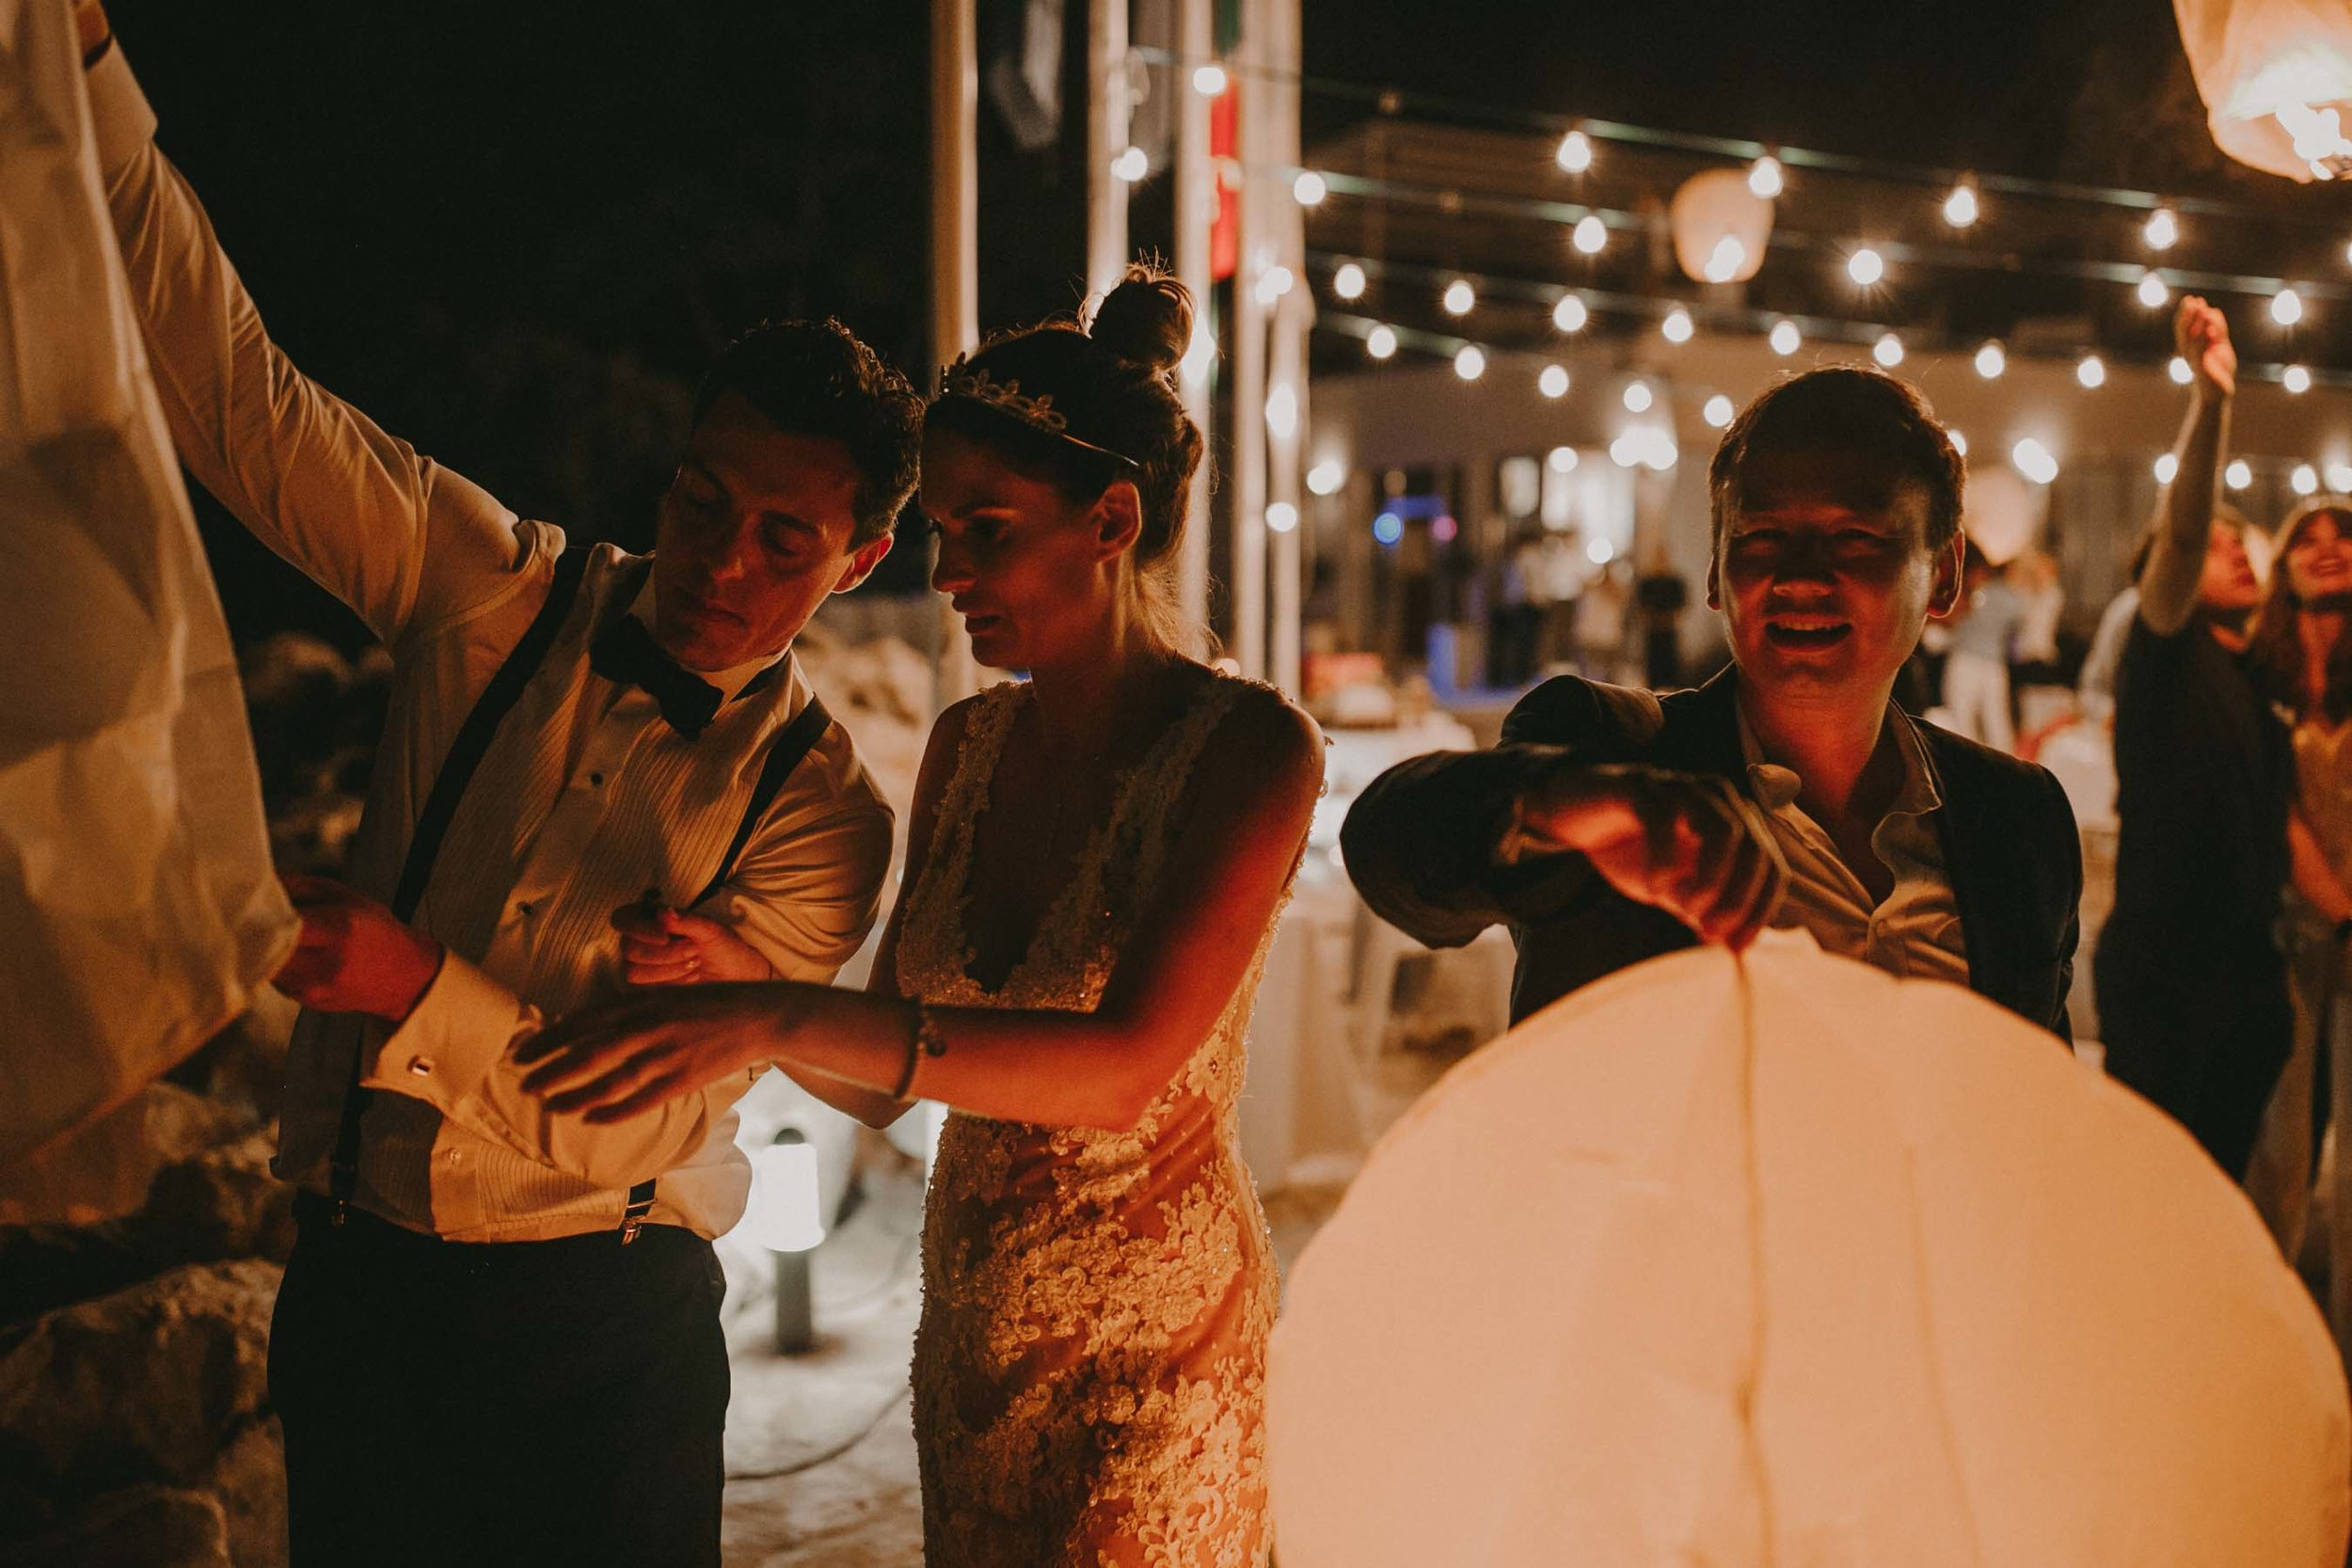 sylvia&dimitri-Wedding-Crvena_Luka-Croatia-134(0891).jpg